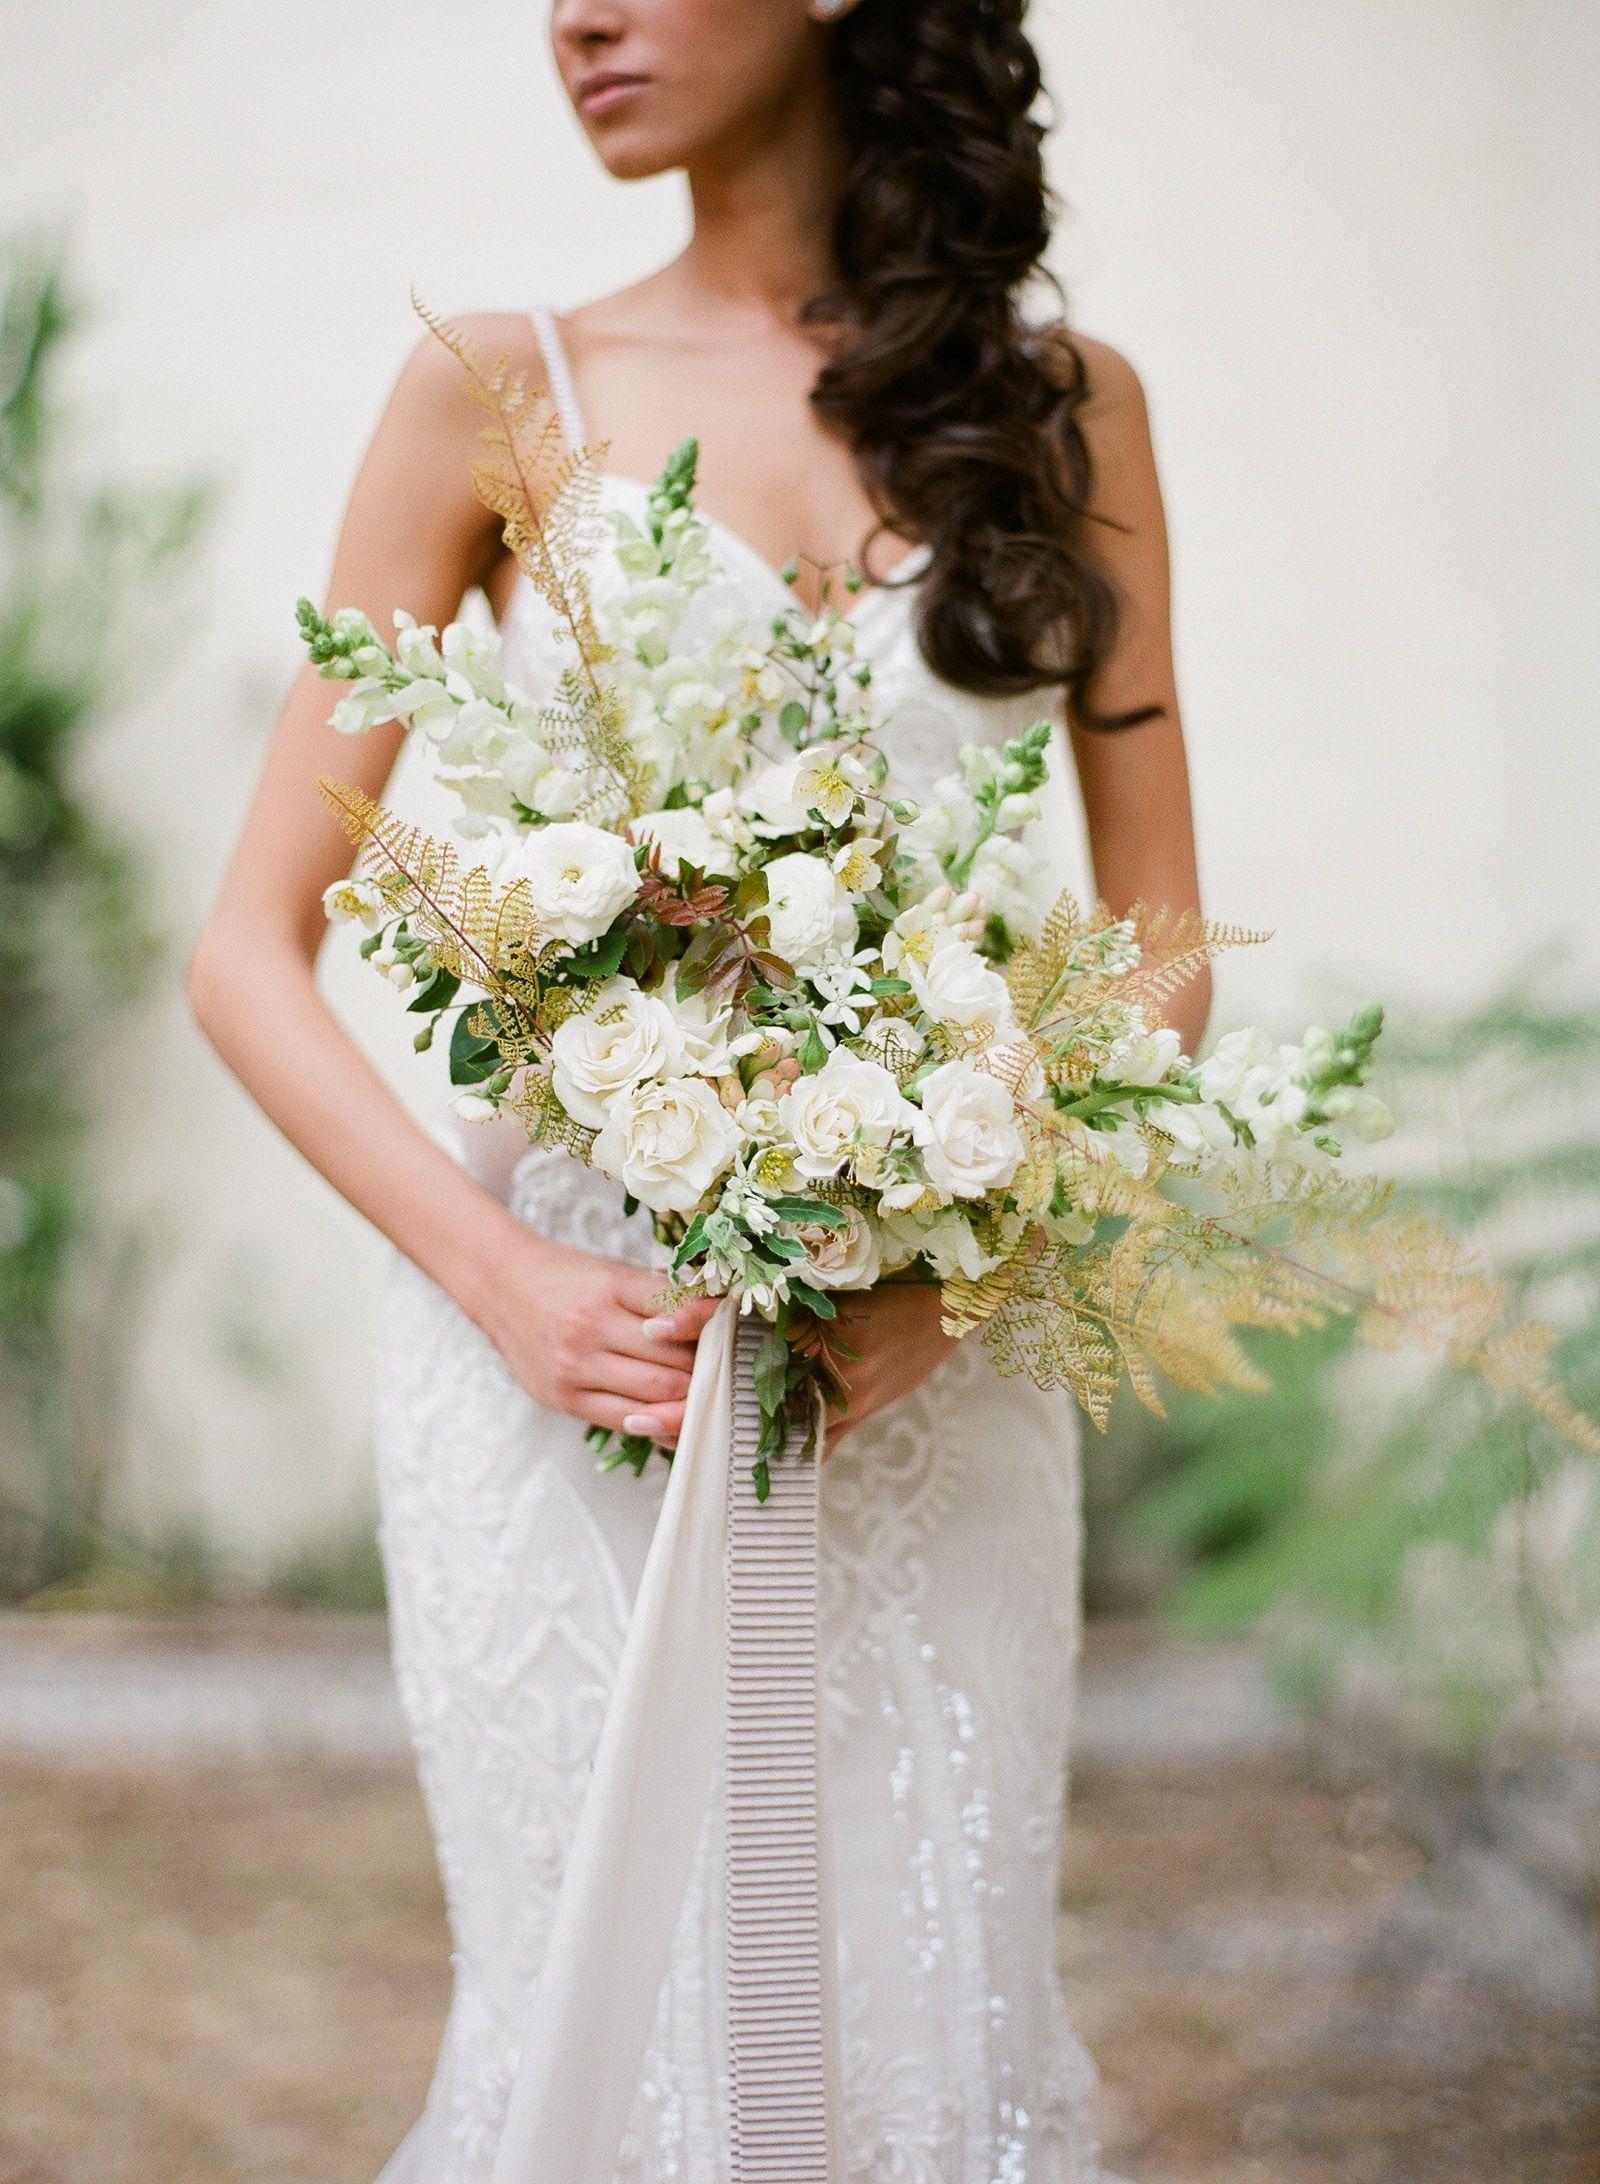 Toronto | Whitney Heard Photography | Sarah Winward Florals | Richard Photo Lab | Glia Lahav | Mar Romero | Romantic | Wild { Wedding } Bouquet |